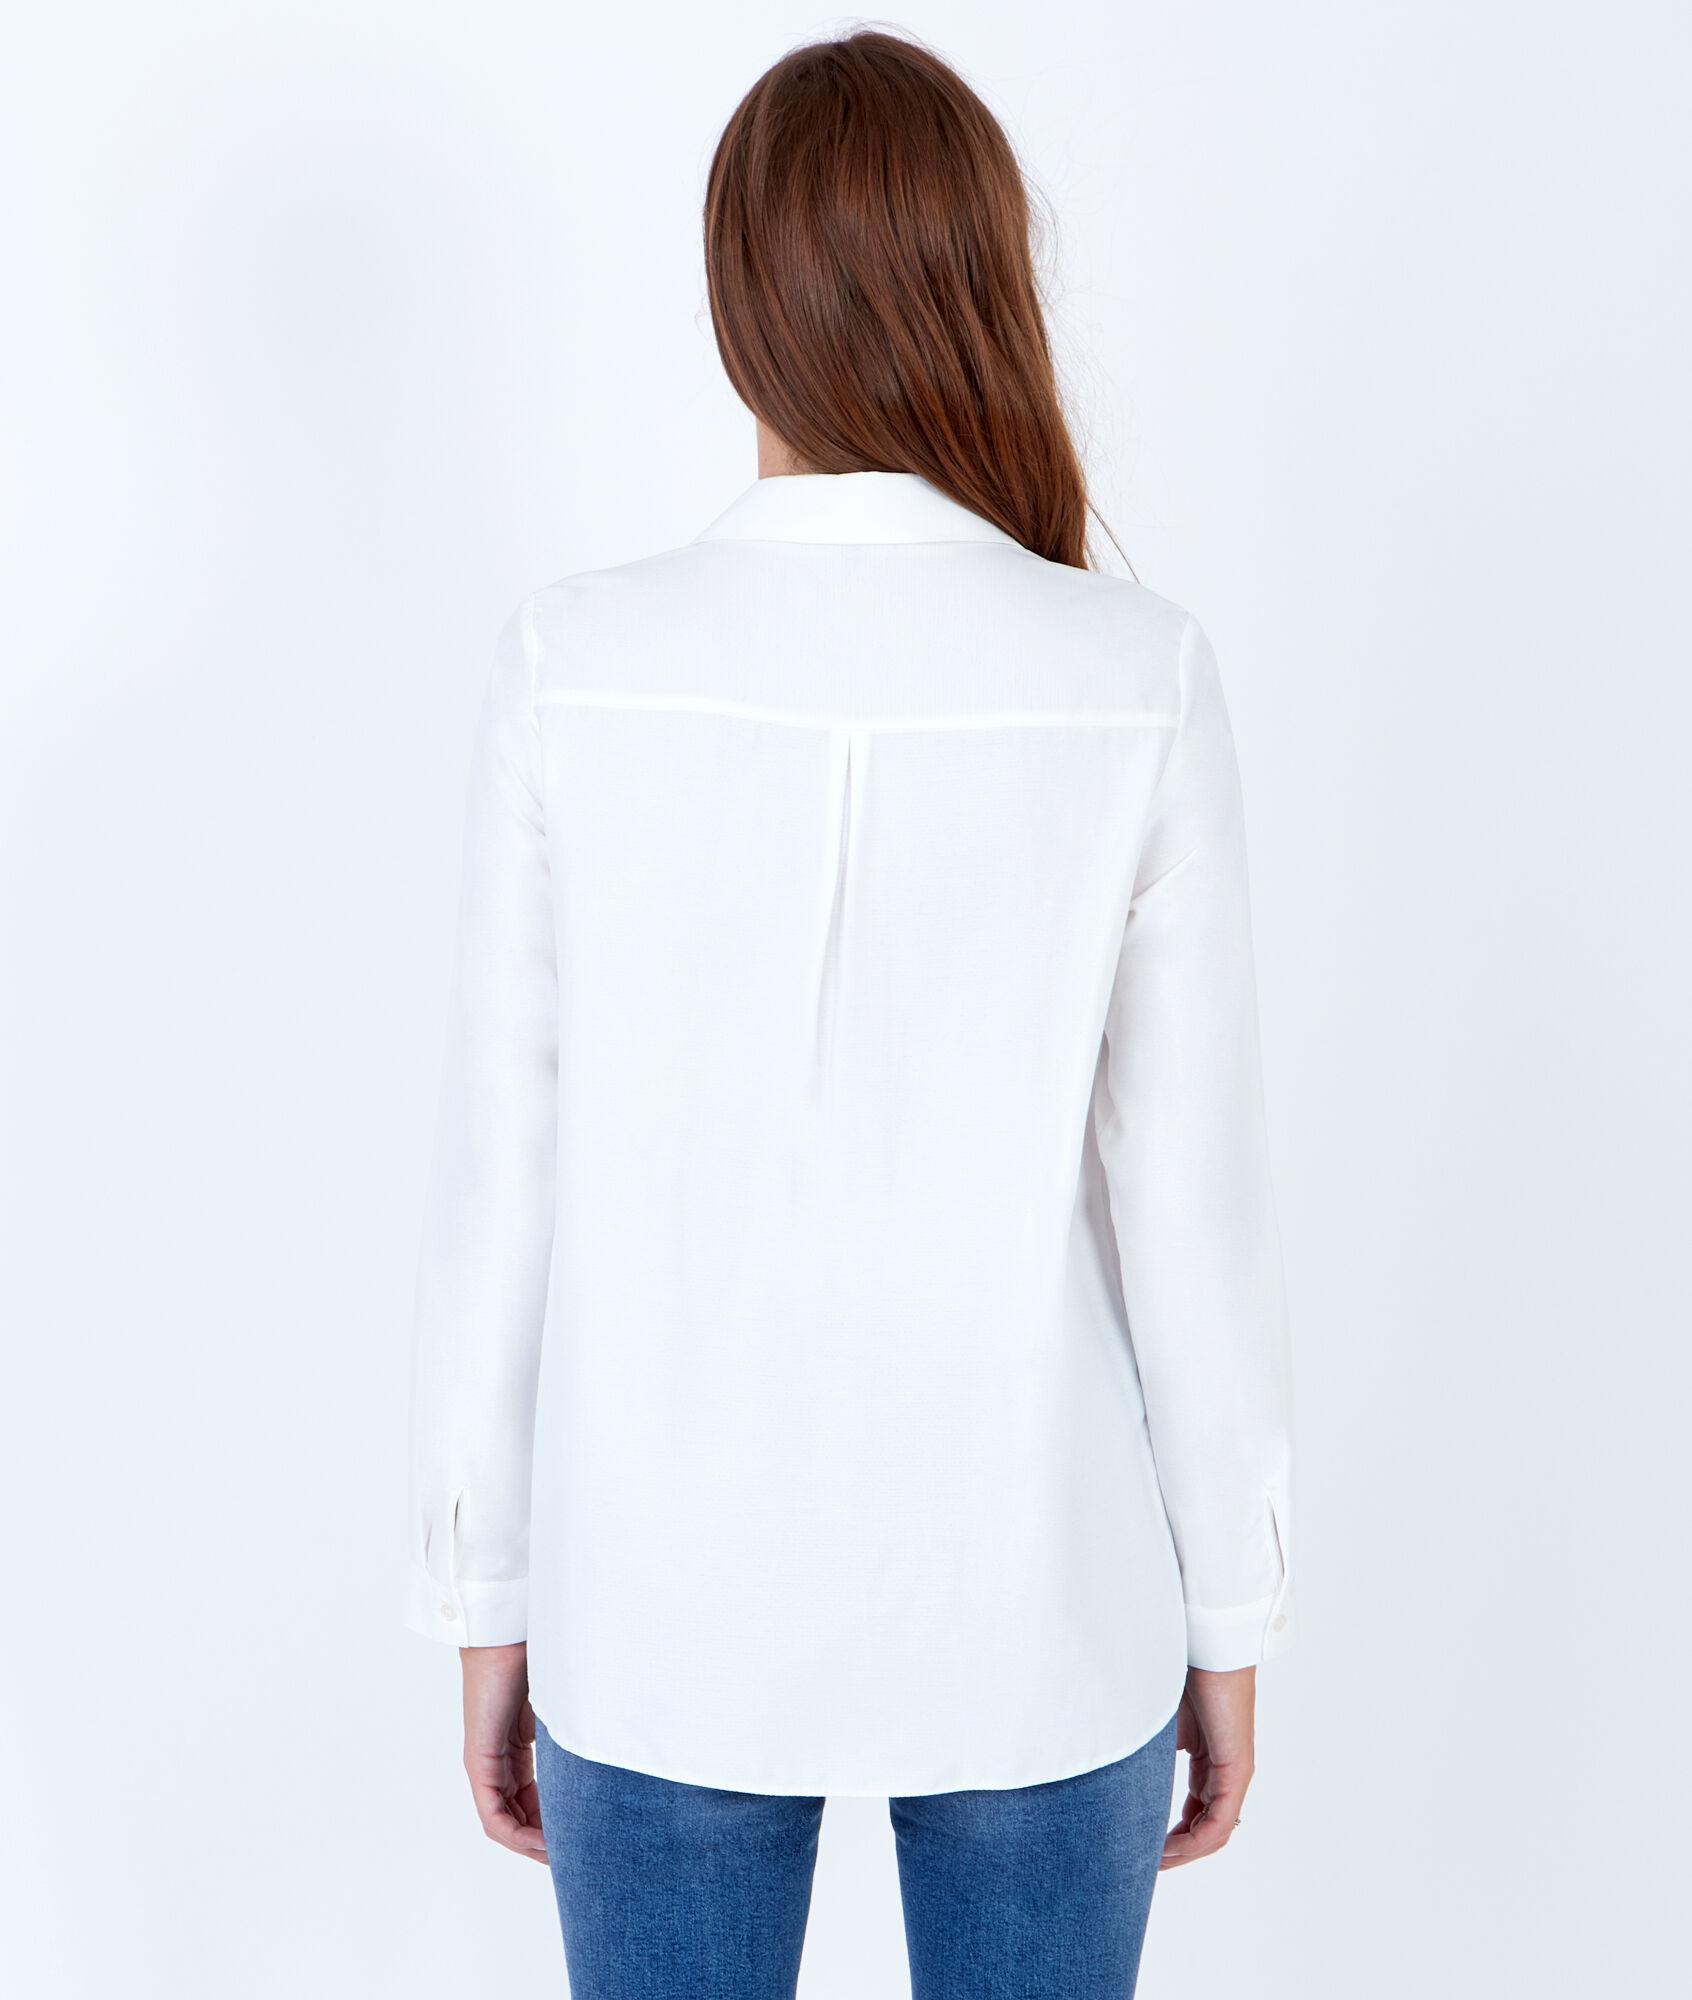 Long sleeve shirt - KELLY - WHITE - Etam e874d4cdbd1